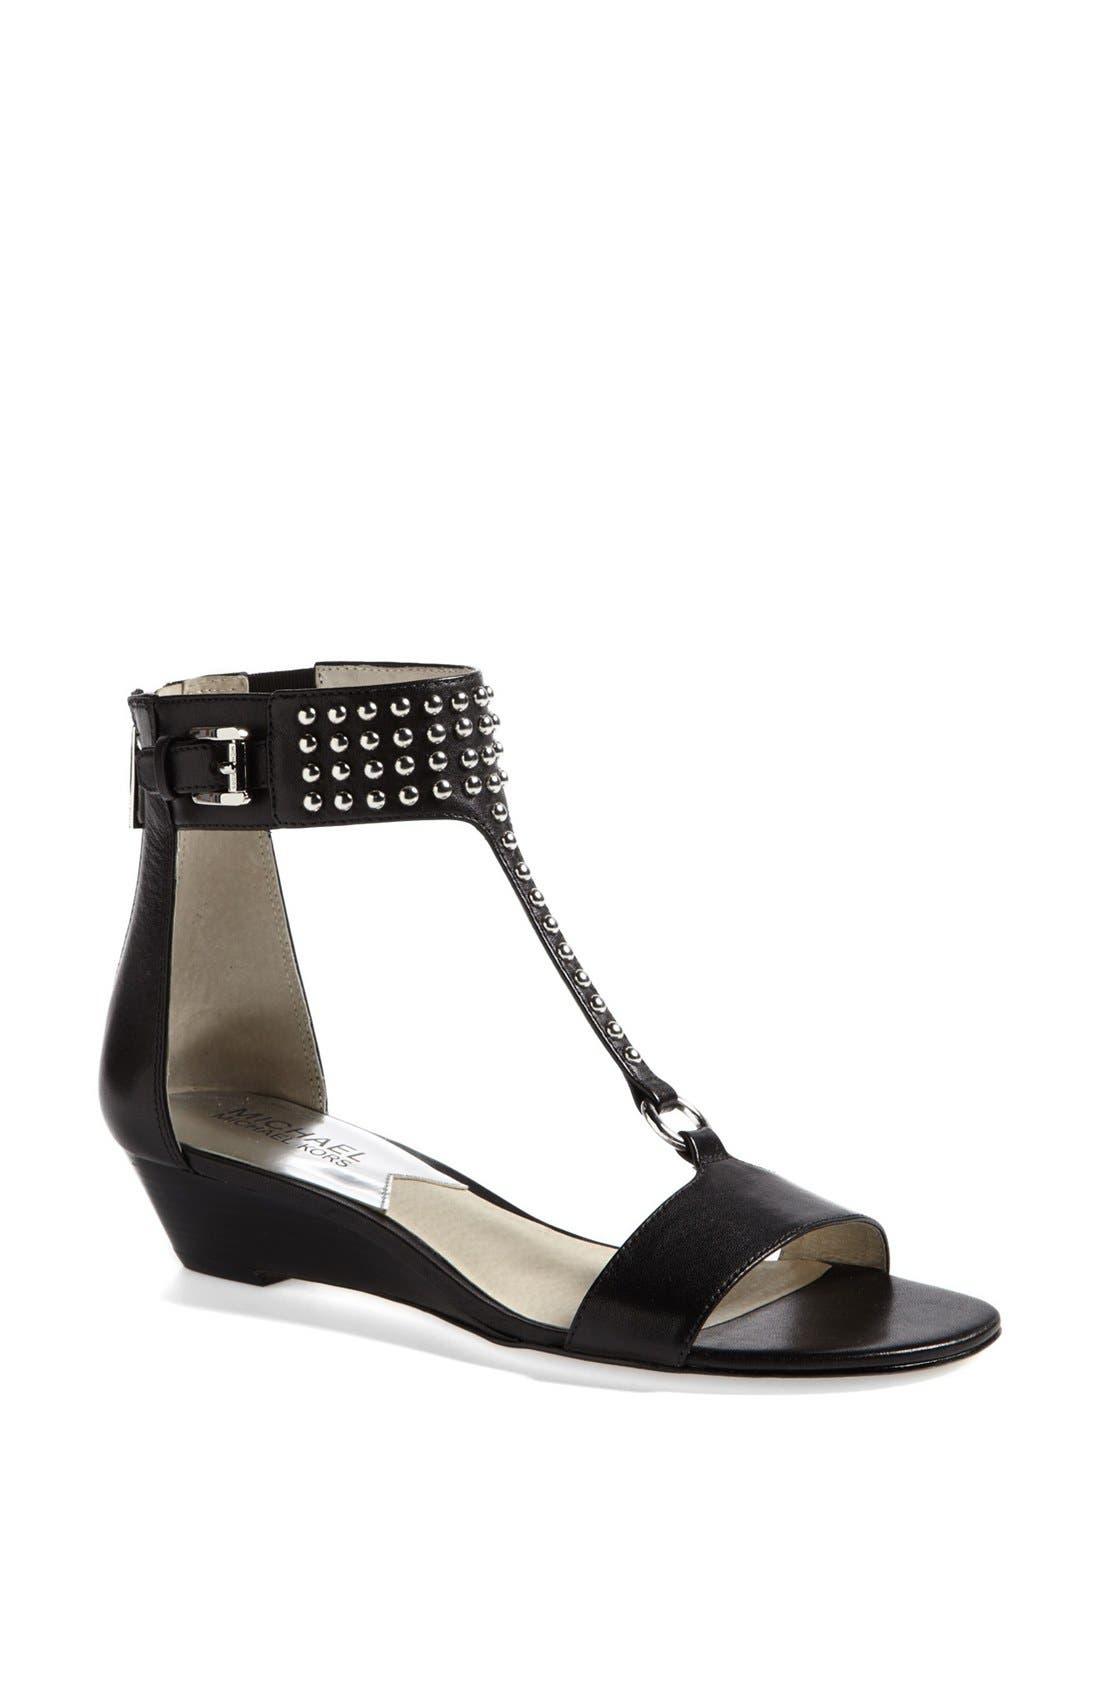 Alternate Image 1 Selected - MICHAEL Michael Kors 'Celena' Wedge Sandal